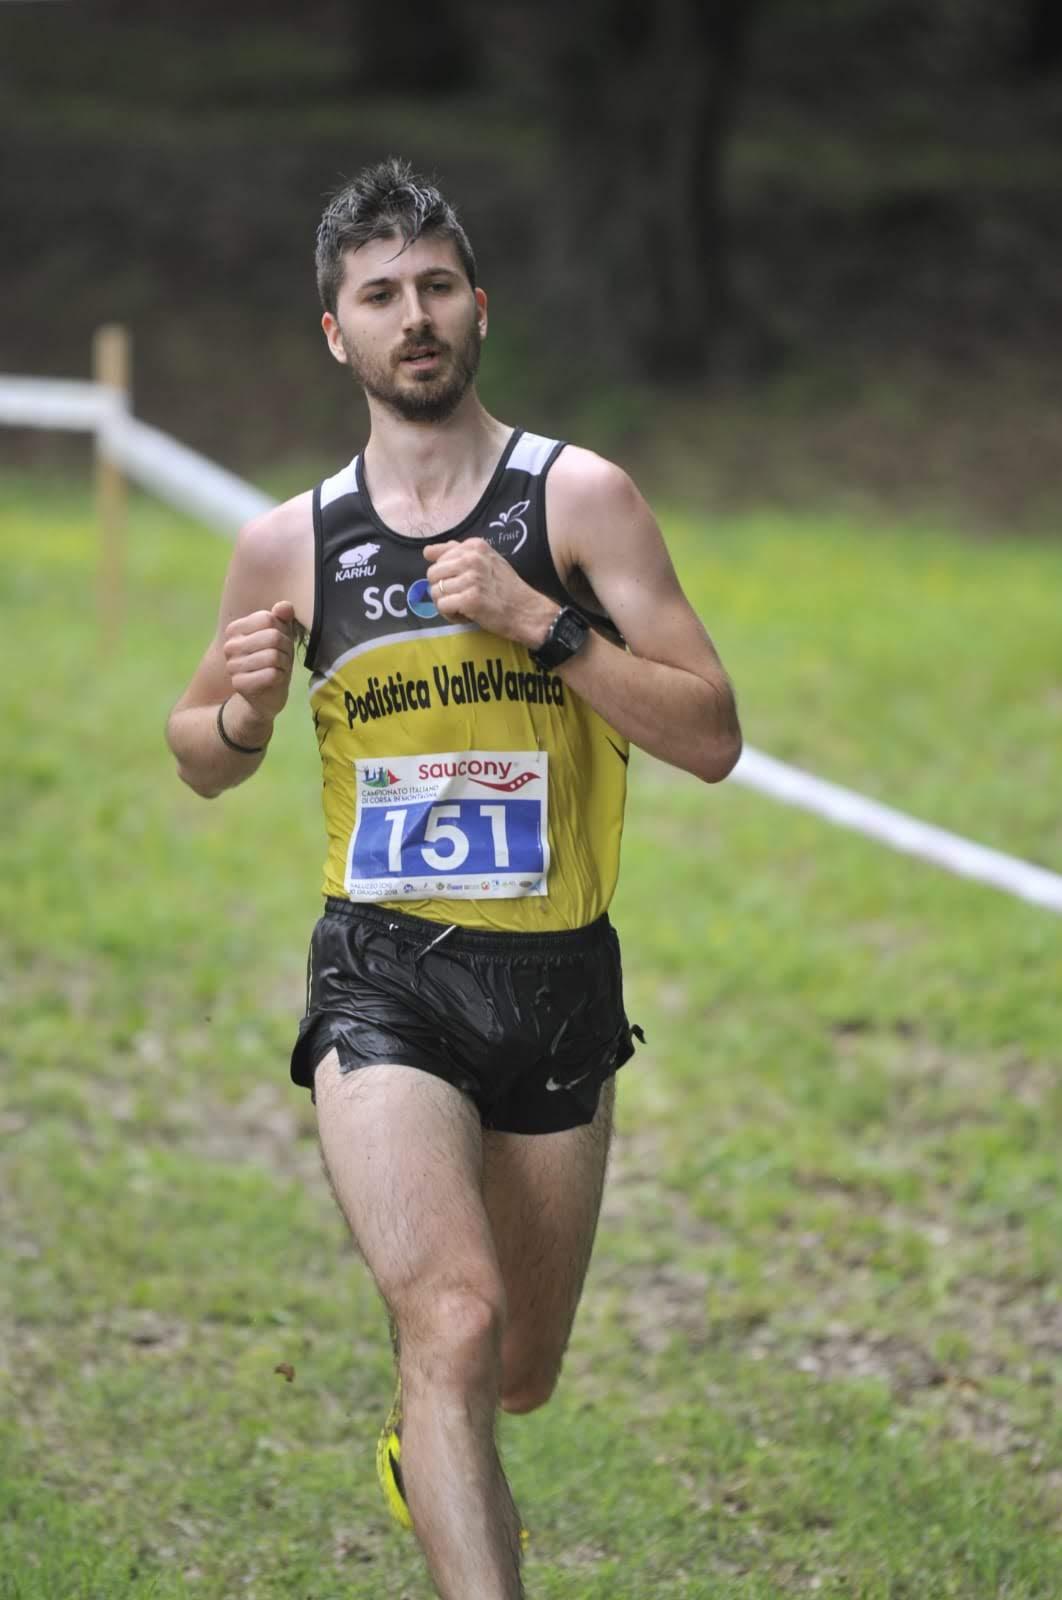 Manuel Solavaggione